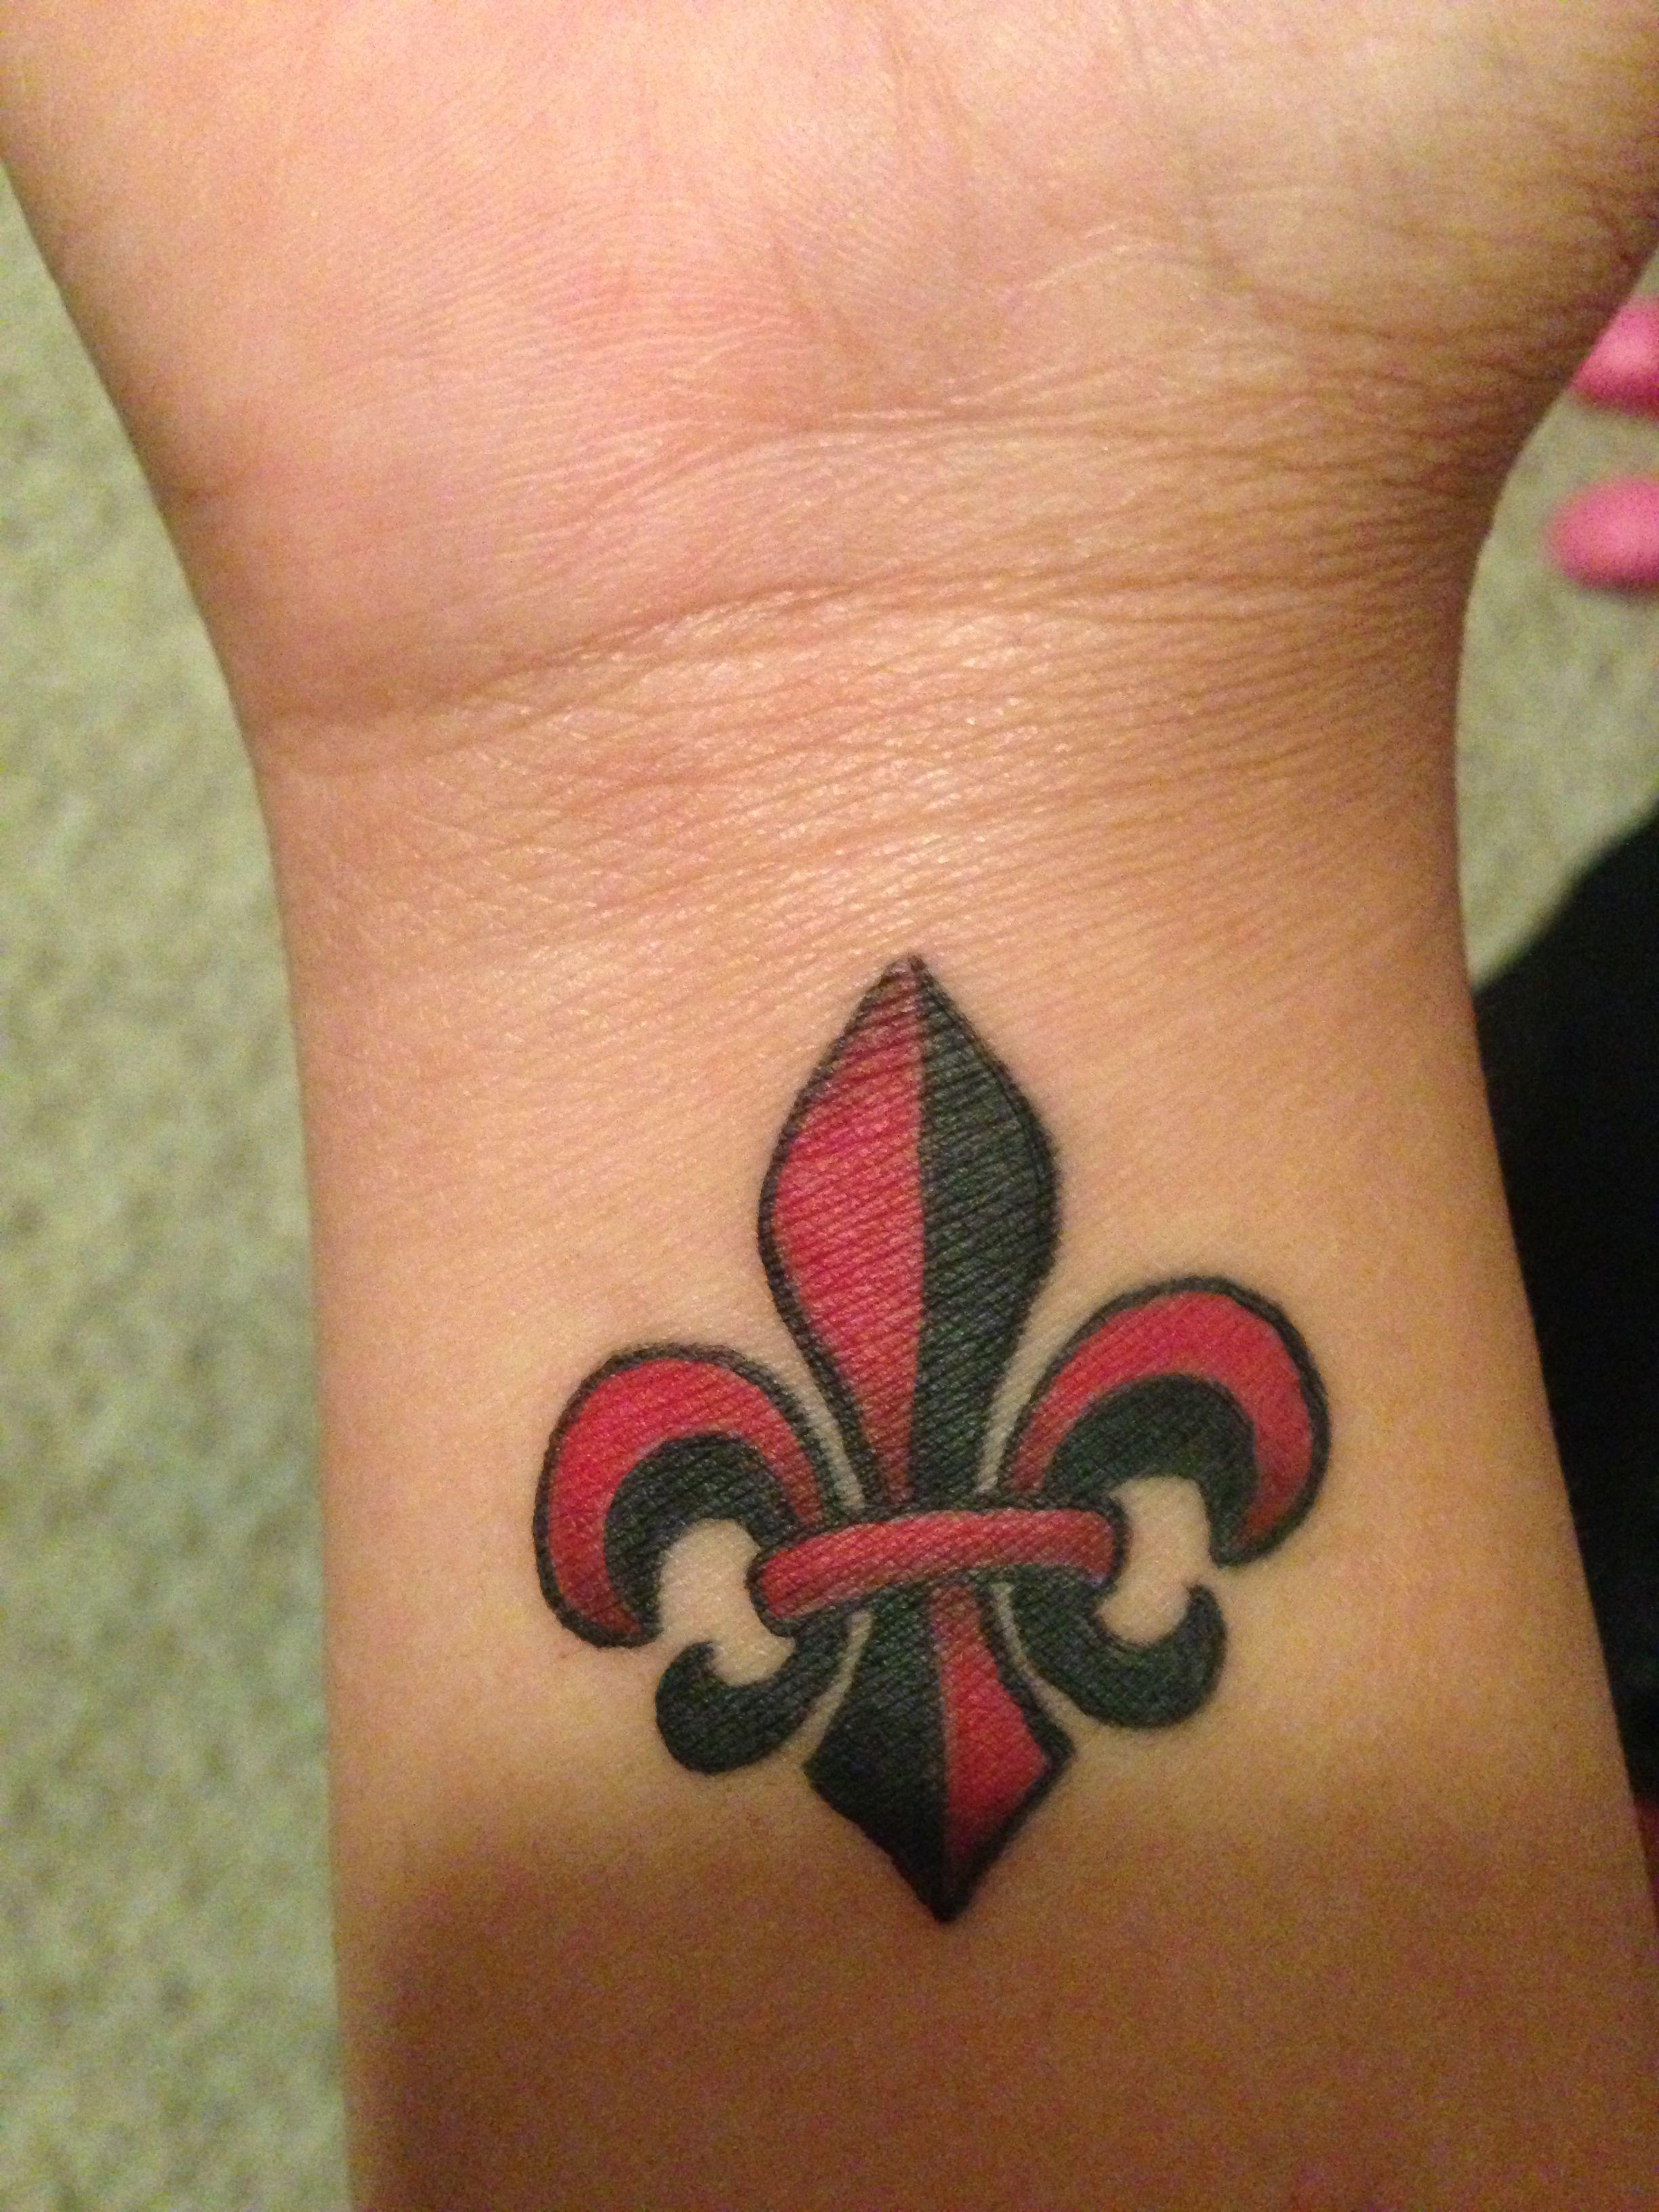 new black red fleur de lis tattoo d my tattoos. Black Bedroom Furniture Sets. Home Design Ideas